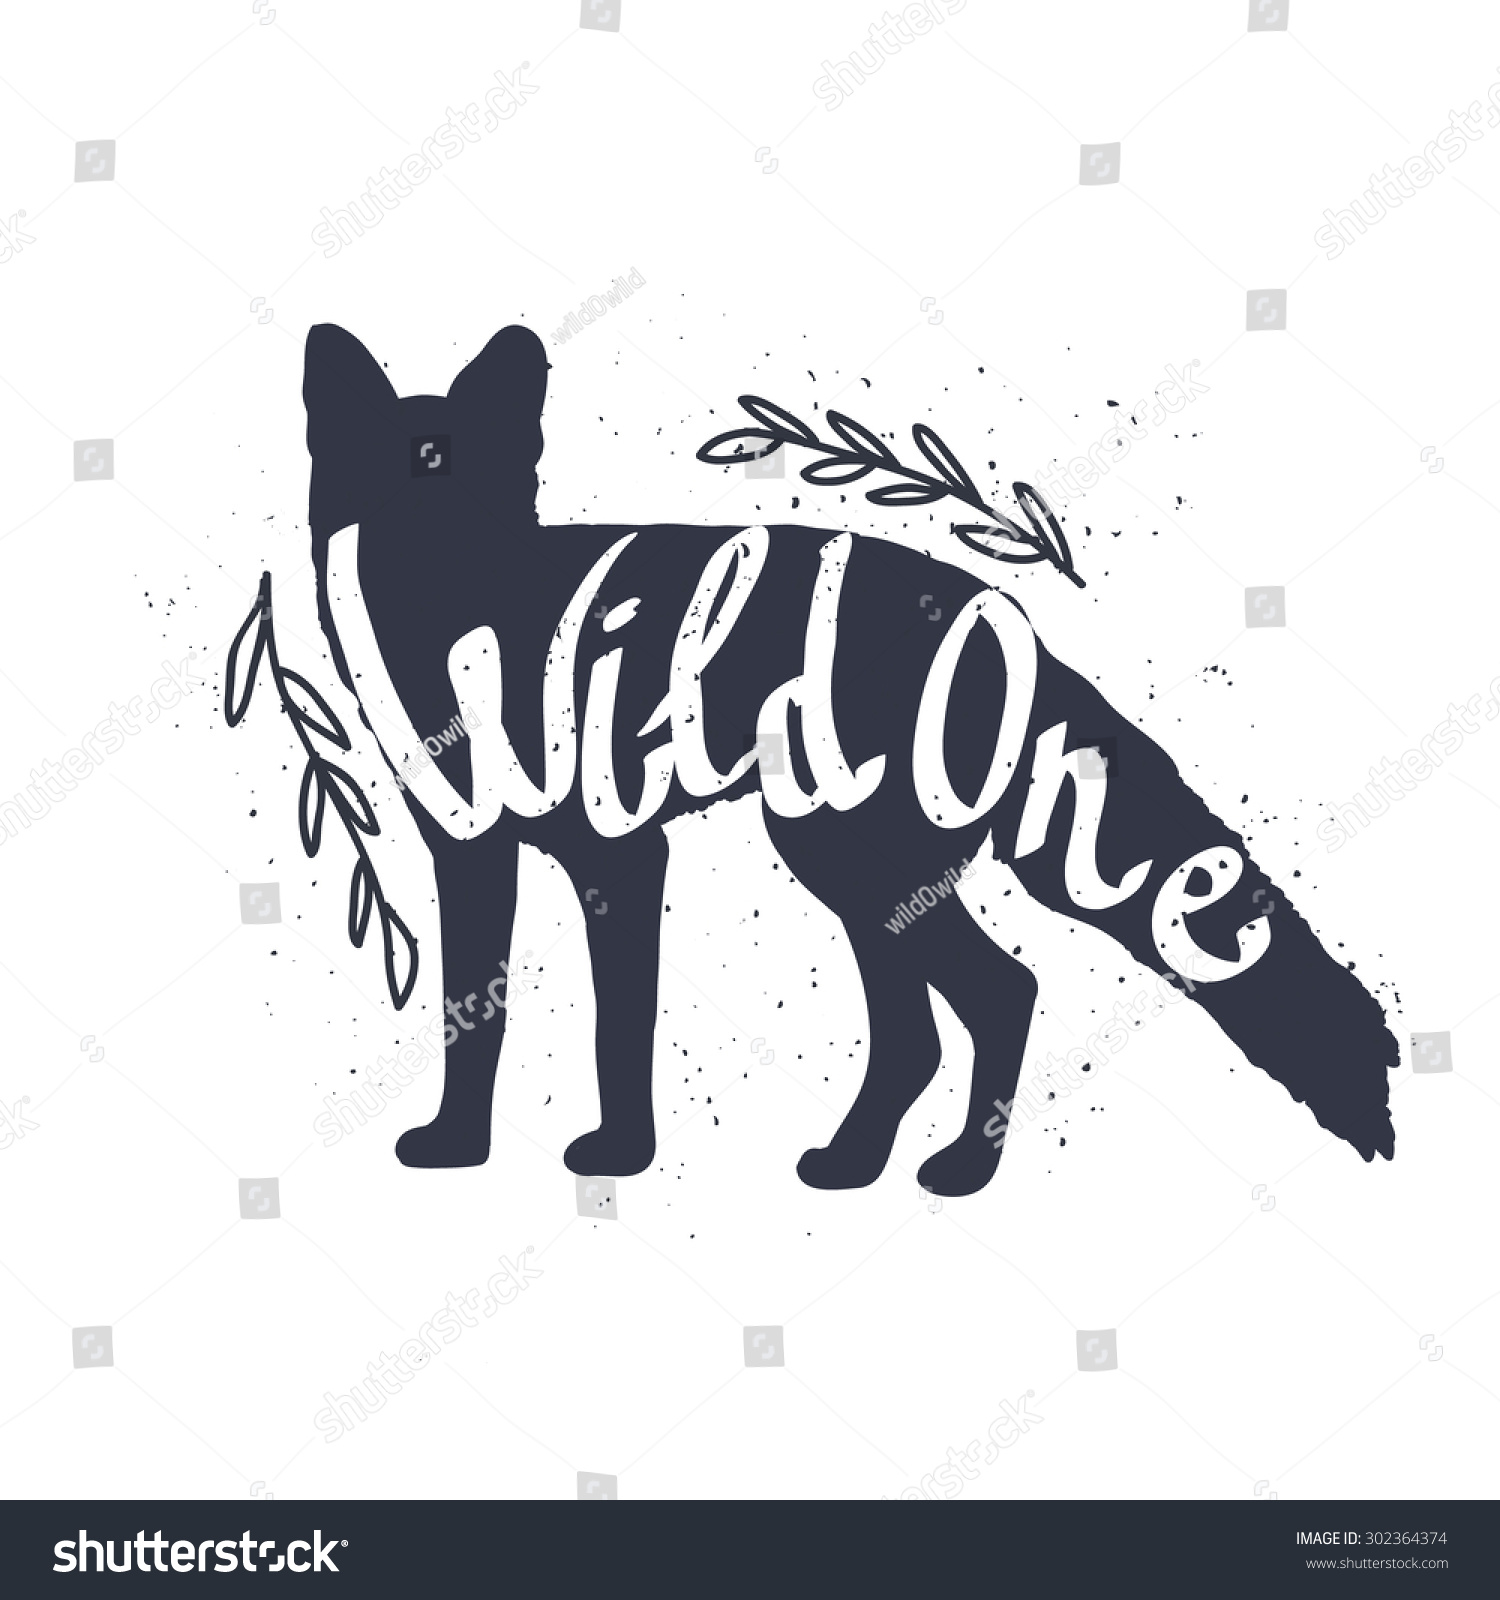 Fox silhouette handdrawn quote wild one stock vector for Wild design